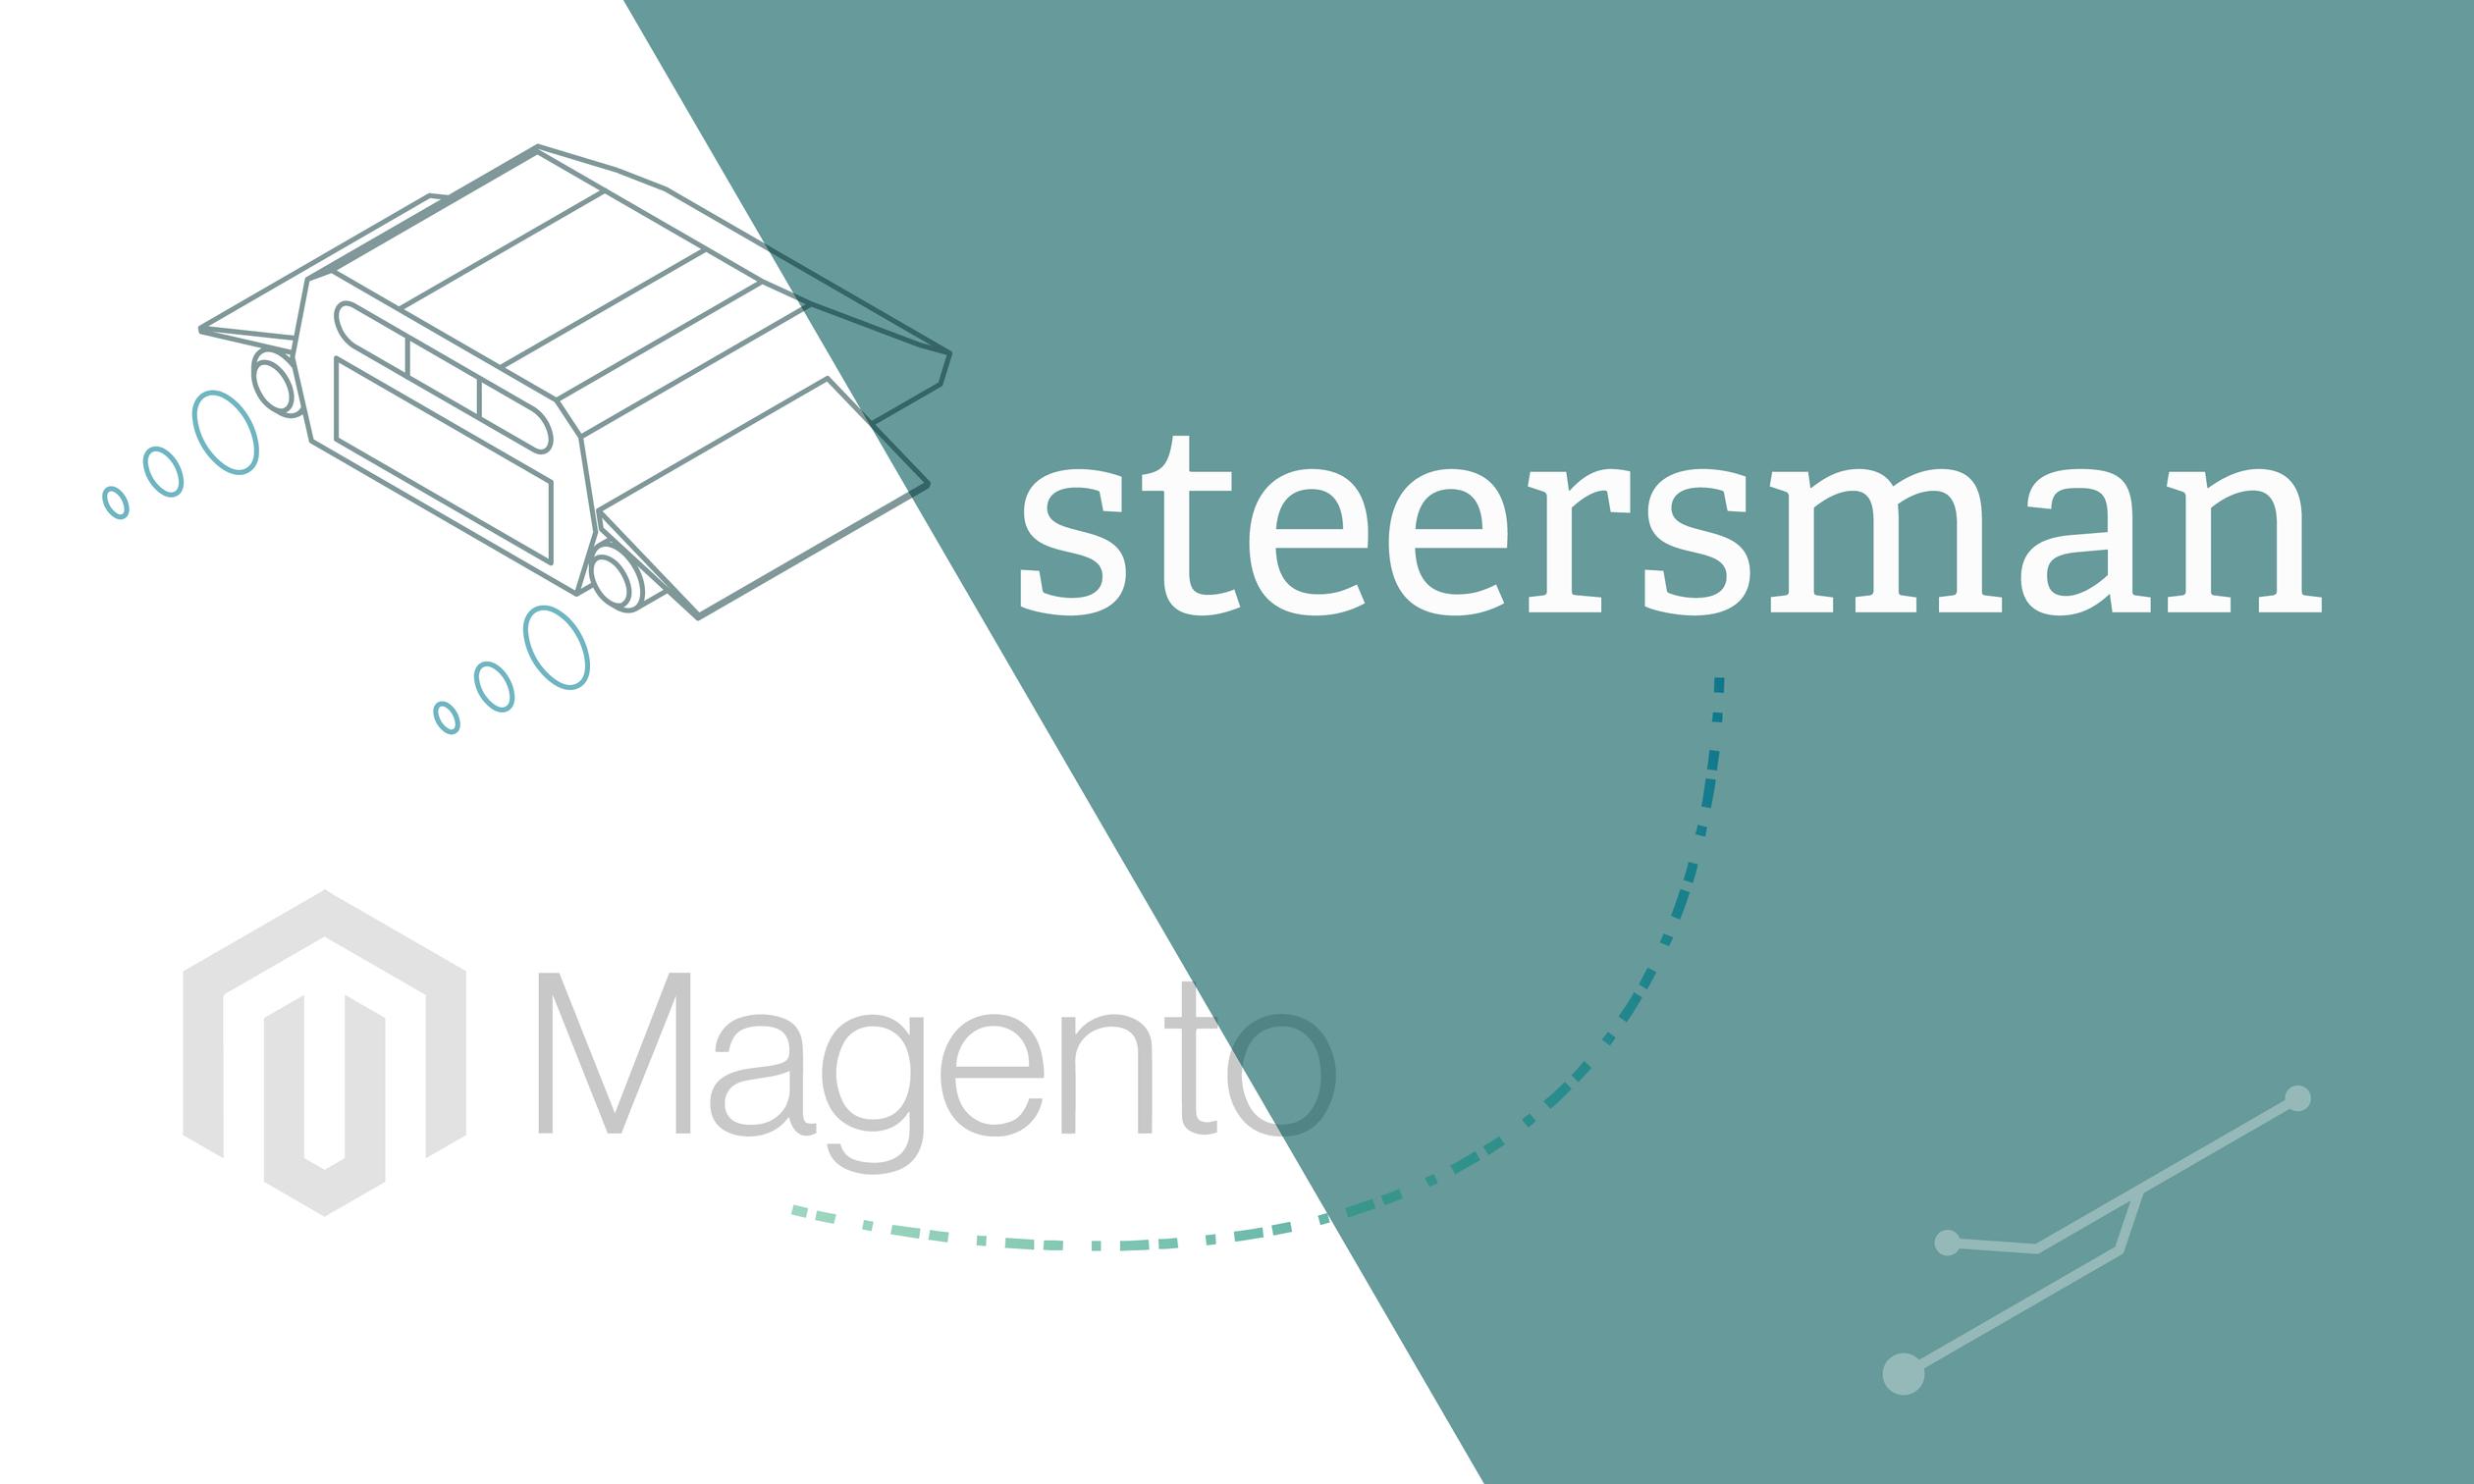 magento steersman migration.png